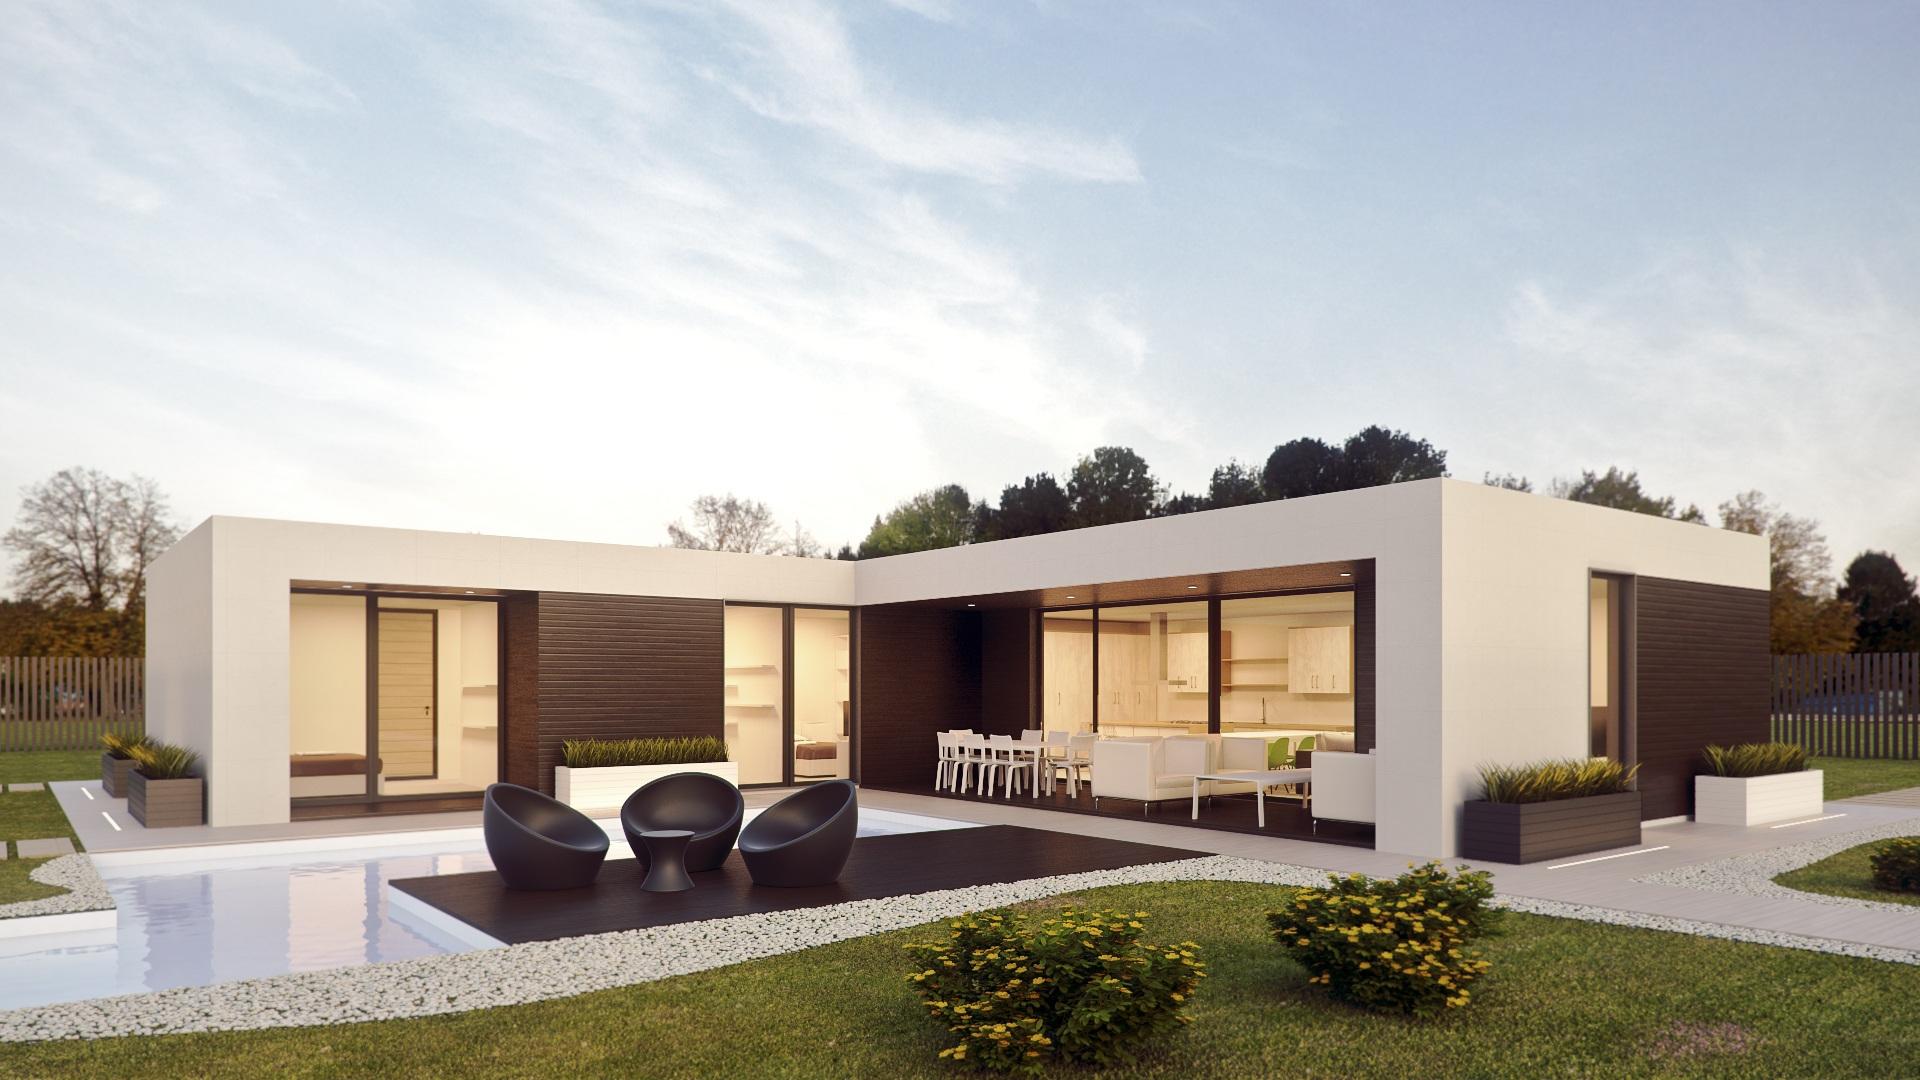 construccion de casas prefabricadas modulares